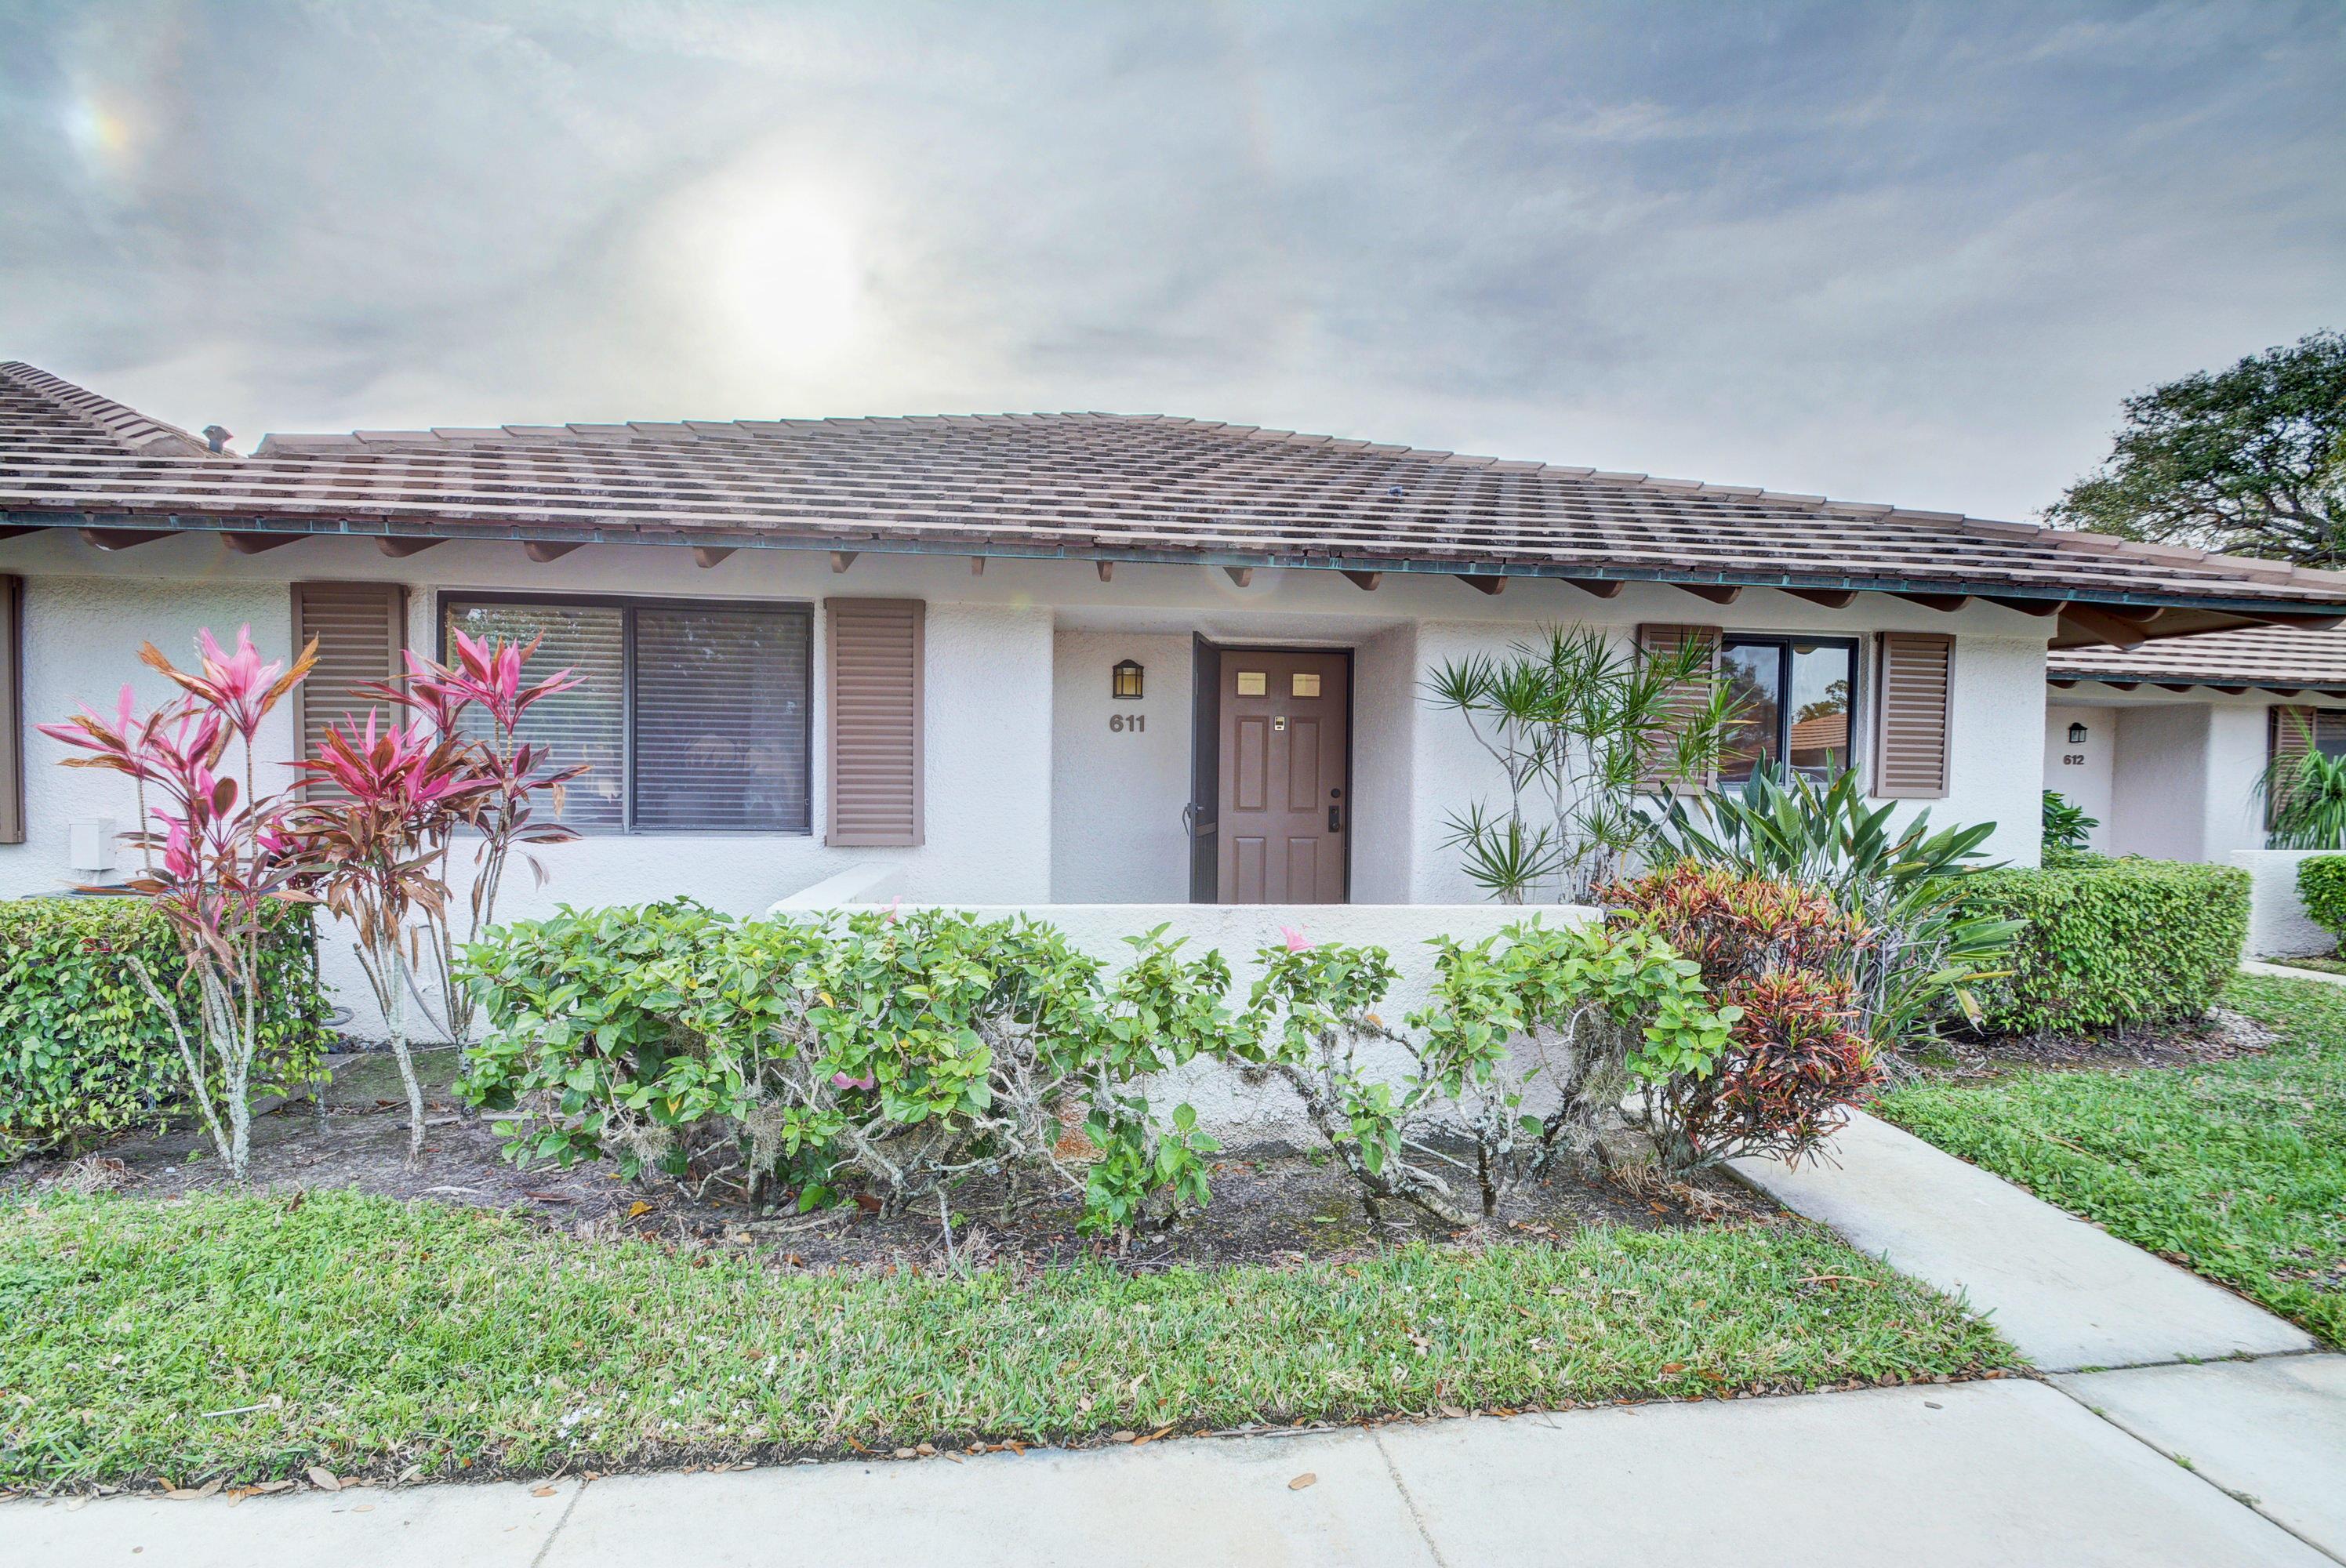 611 Club Drive, Palm Beach Gardens, Florida 33418, 2 Bedrooms Bedrooms, ,2 BathroomsBathrooms,A,Townhouse,Club,RX-10404976